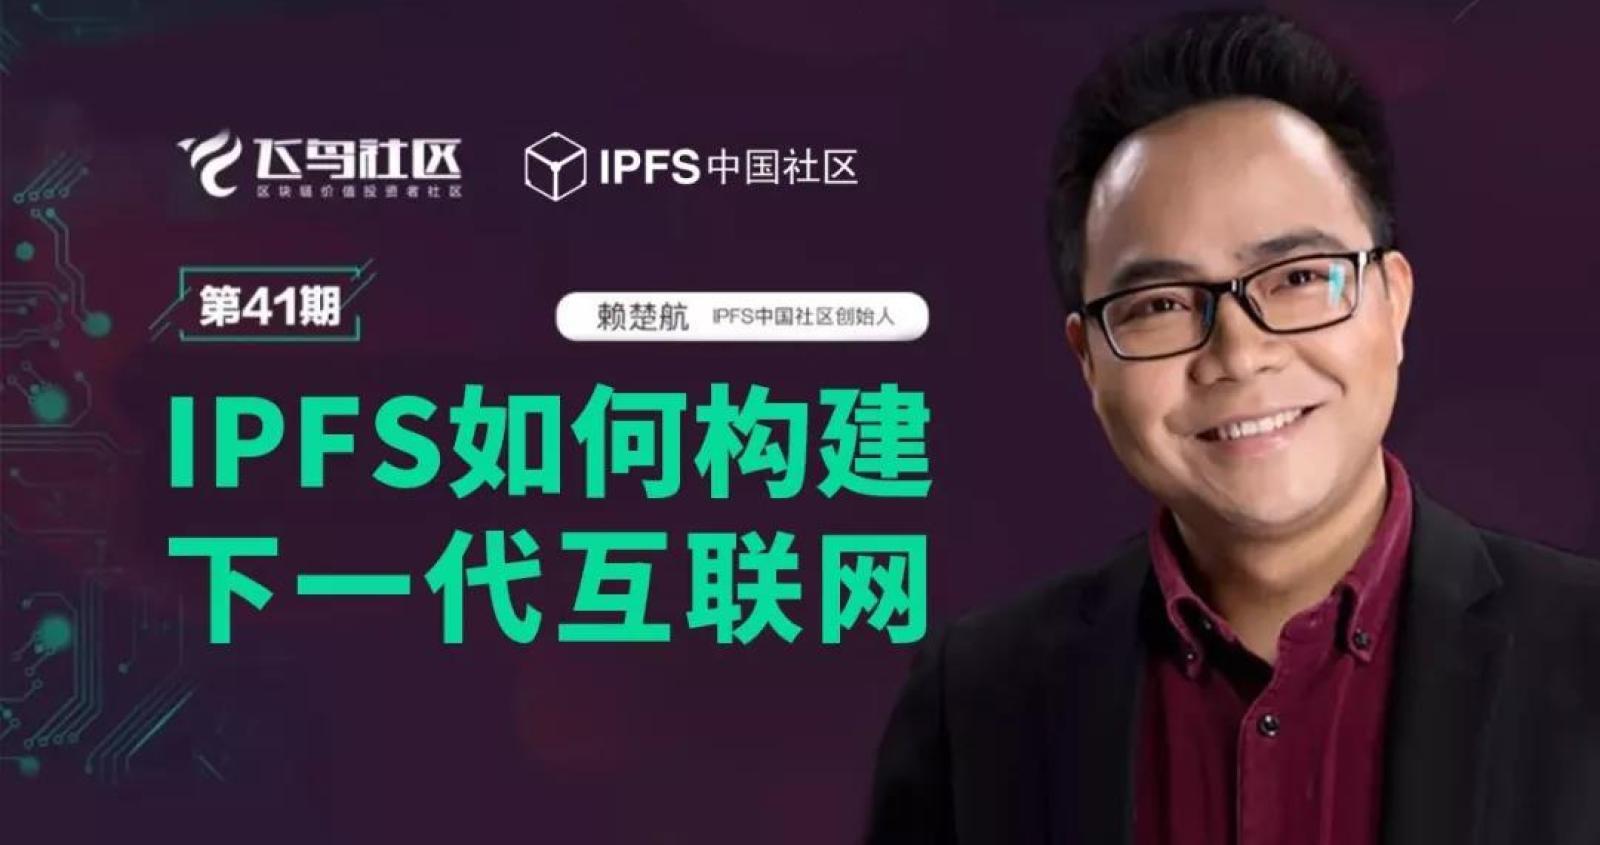 IPFS中国社区赖楚航:IPFS如何构建下一代互联网